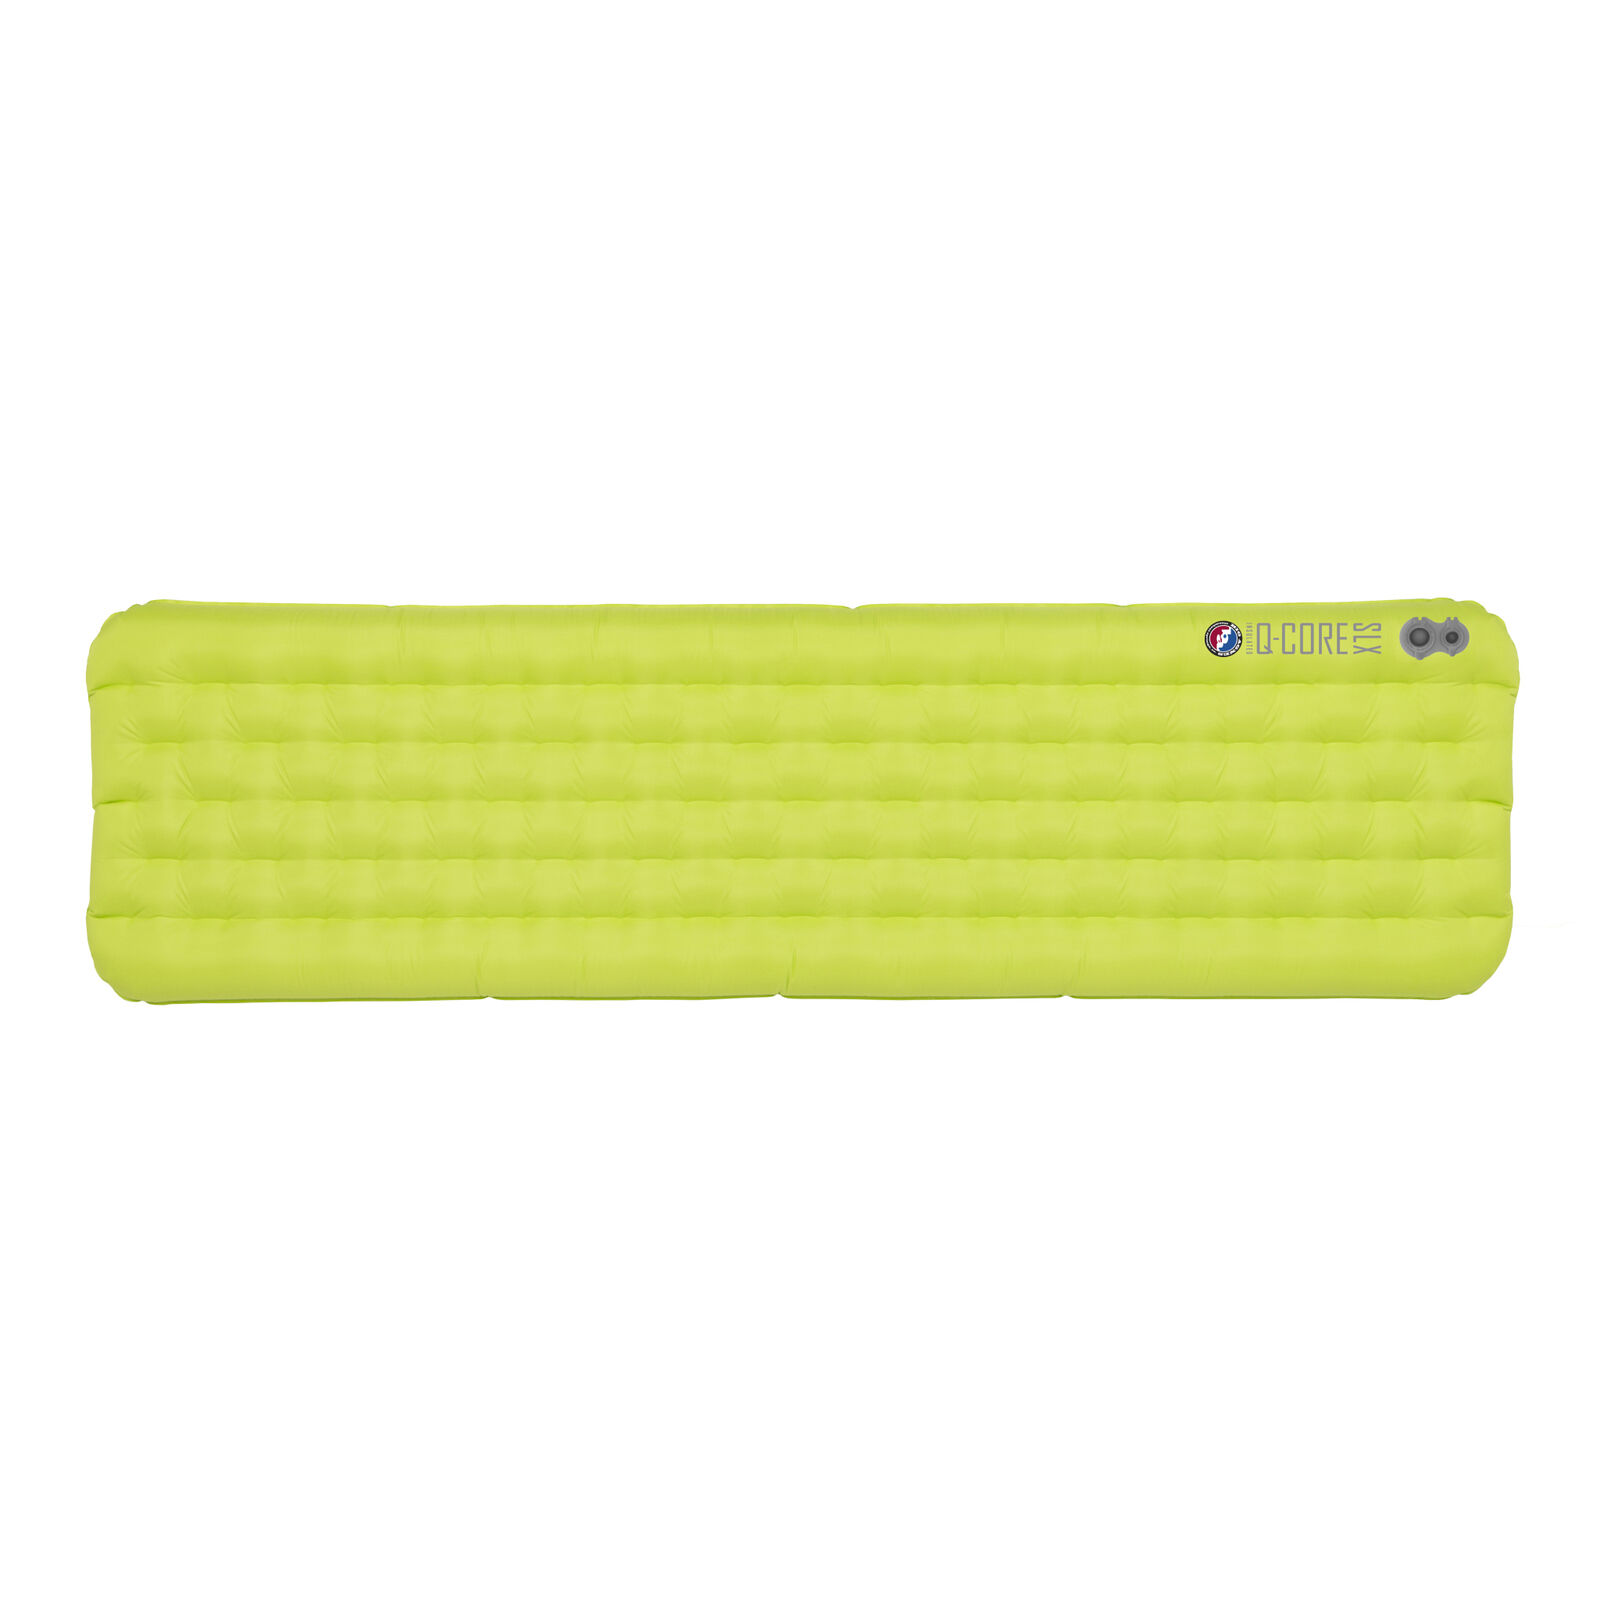 Big Agnes Q Core SLX Sleeping Pad Lime Green Regular (20x72)